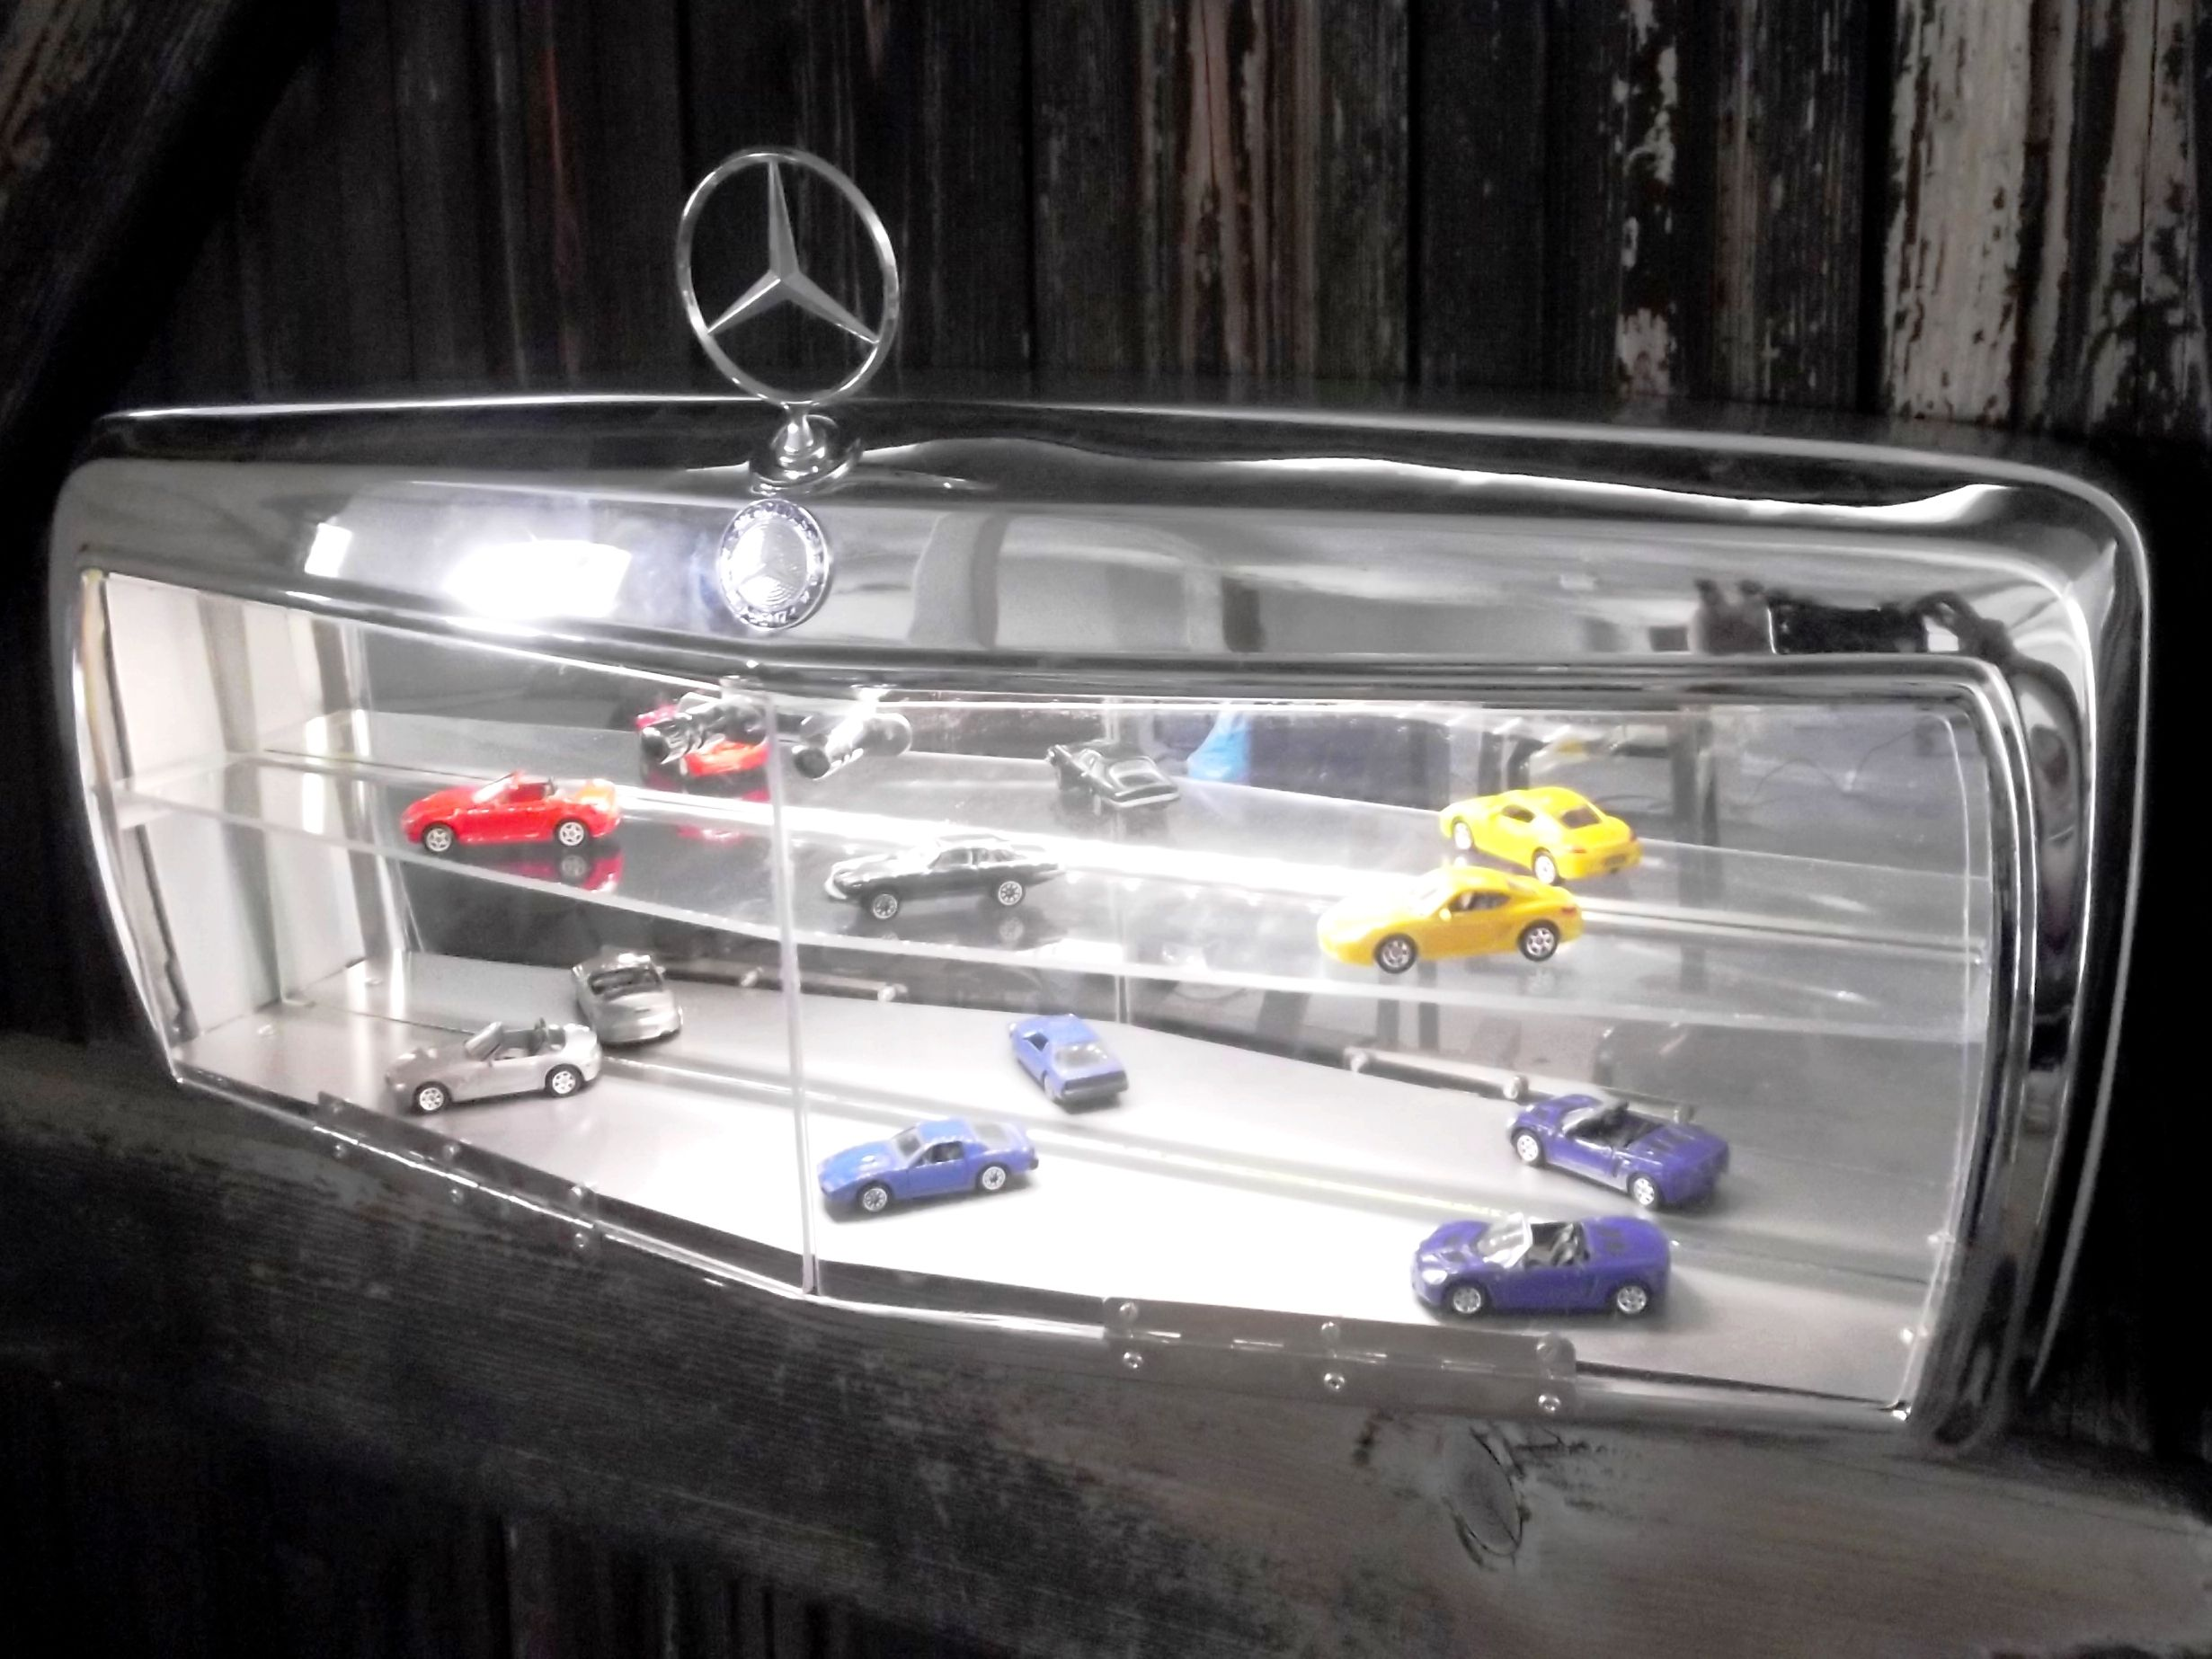 Objekte/Lampen - Automöbeldesign | Möbel & Accessoires aus ...